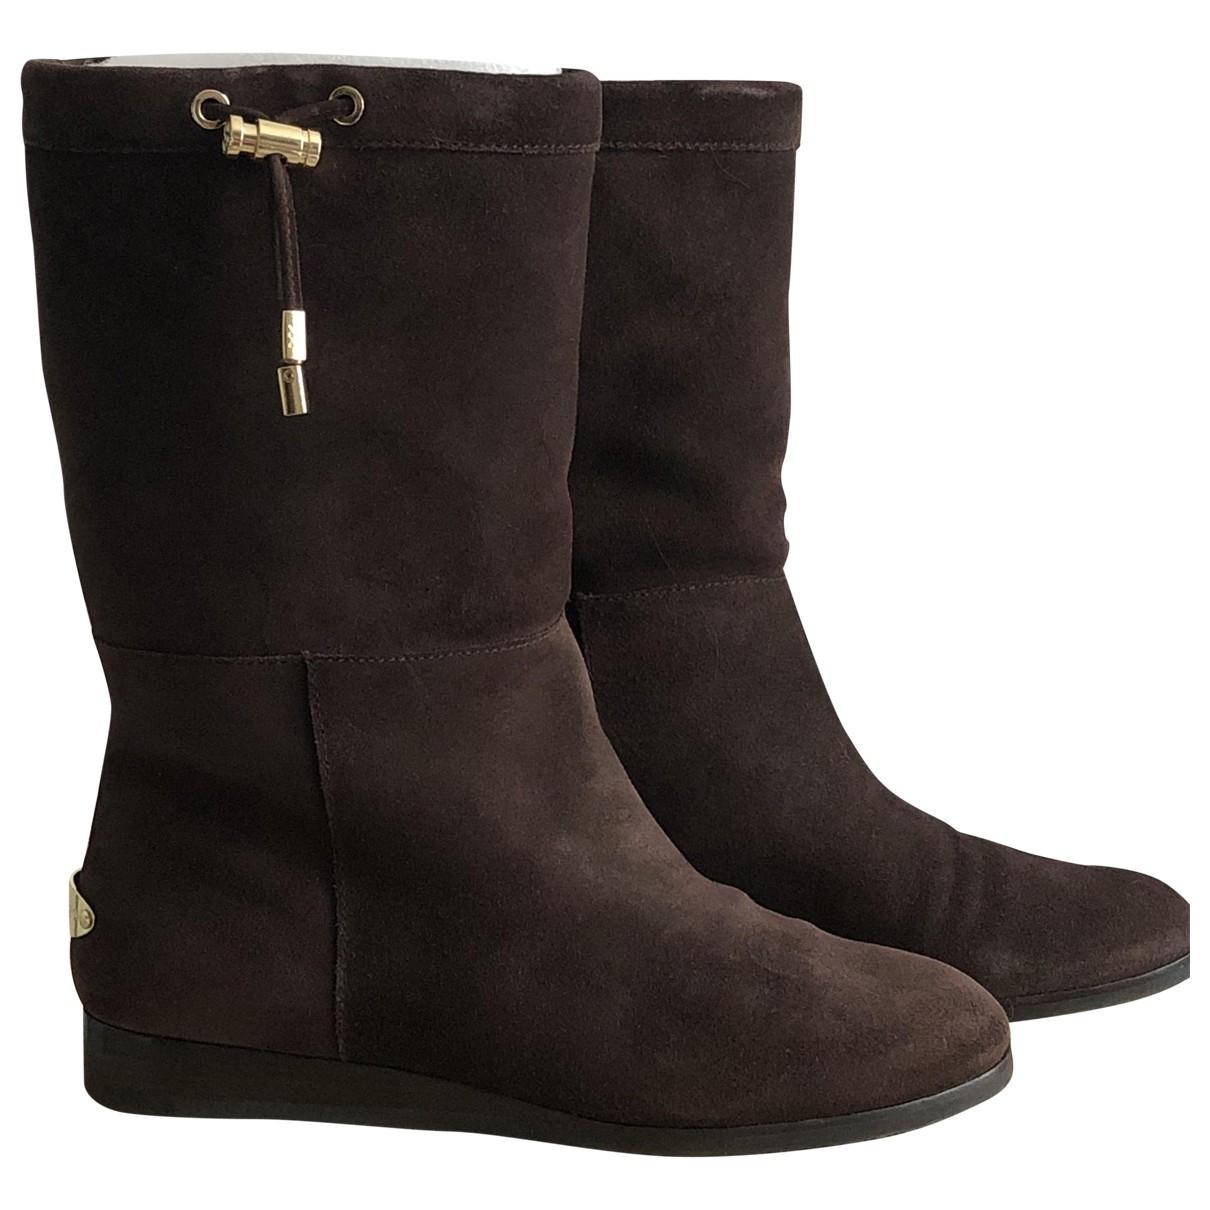 Michael Kors \N Brown Suede Boots for Women 38 EU